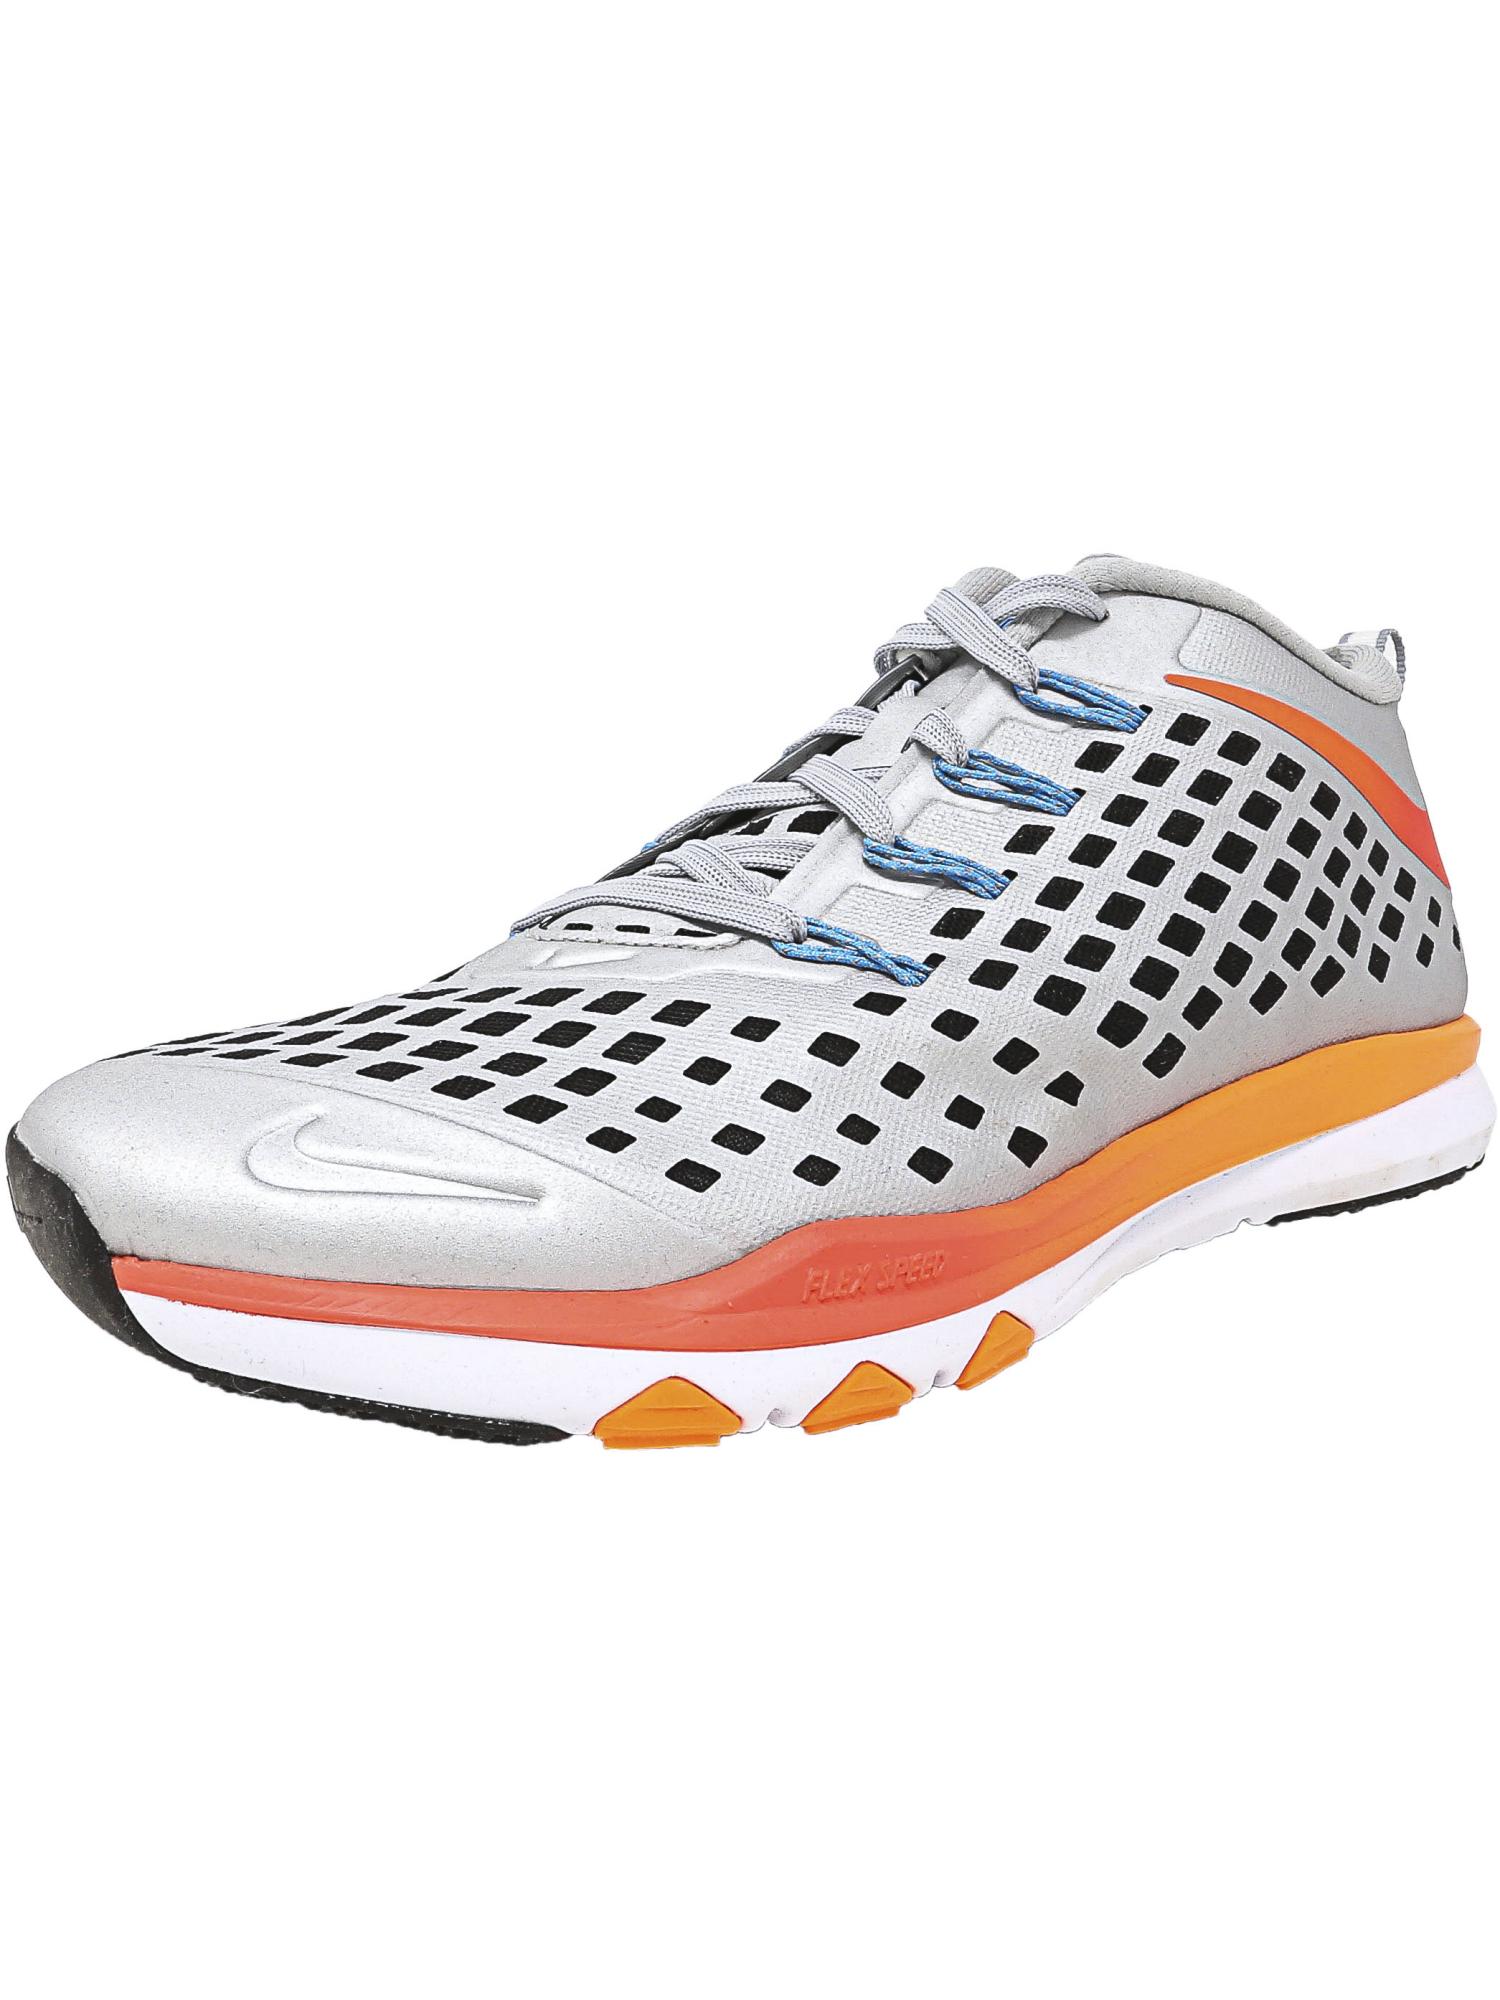 Nike männer zug amp schnell amp zug knöchel hohen ausbildungs - schuhe 61bc58